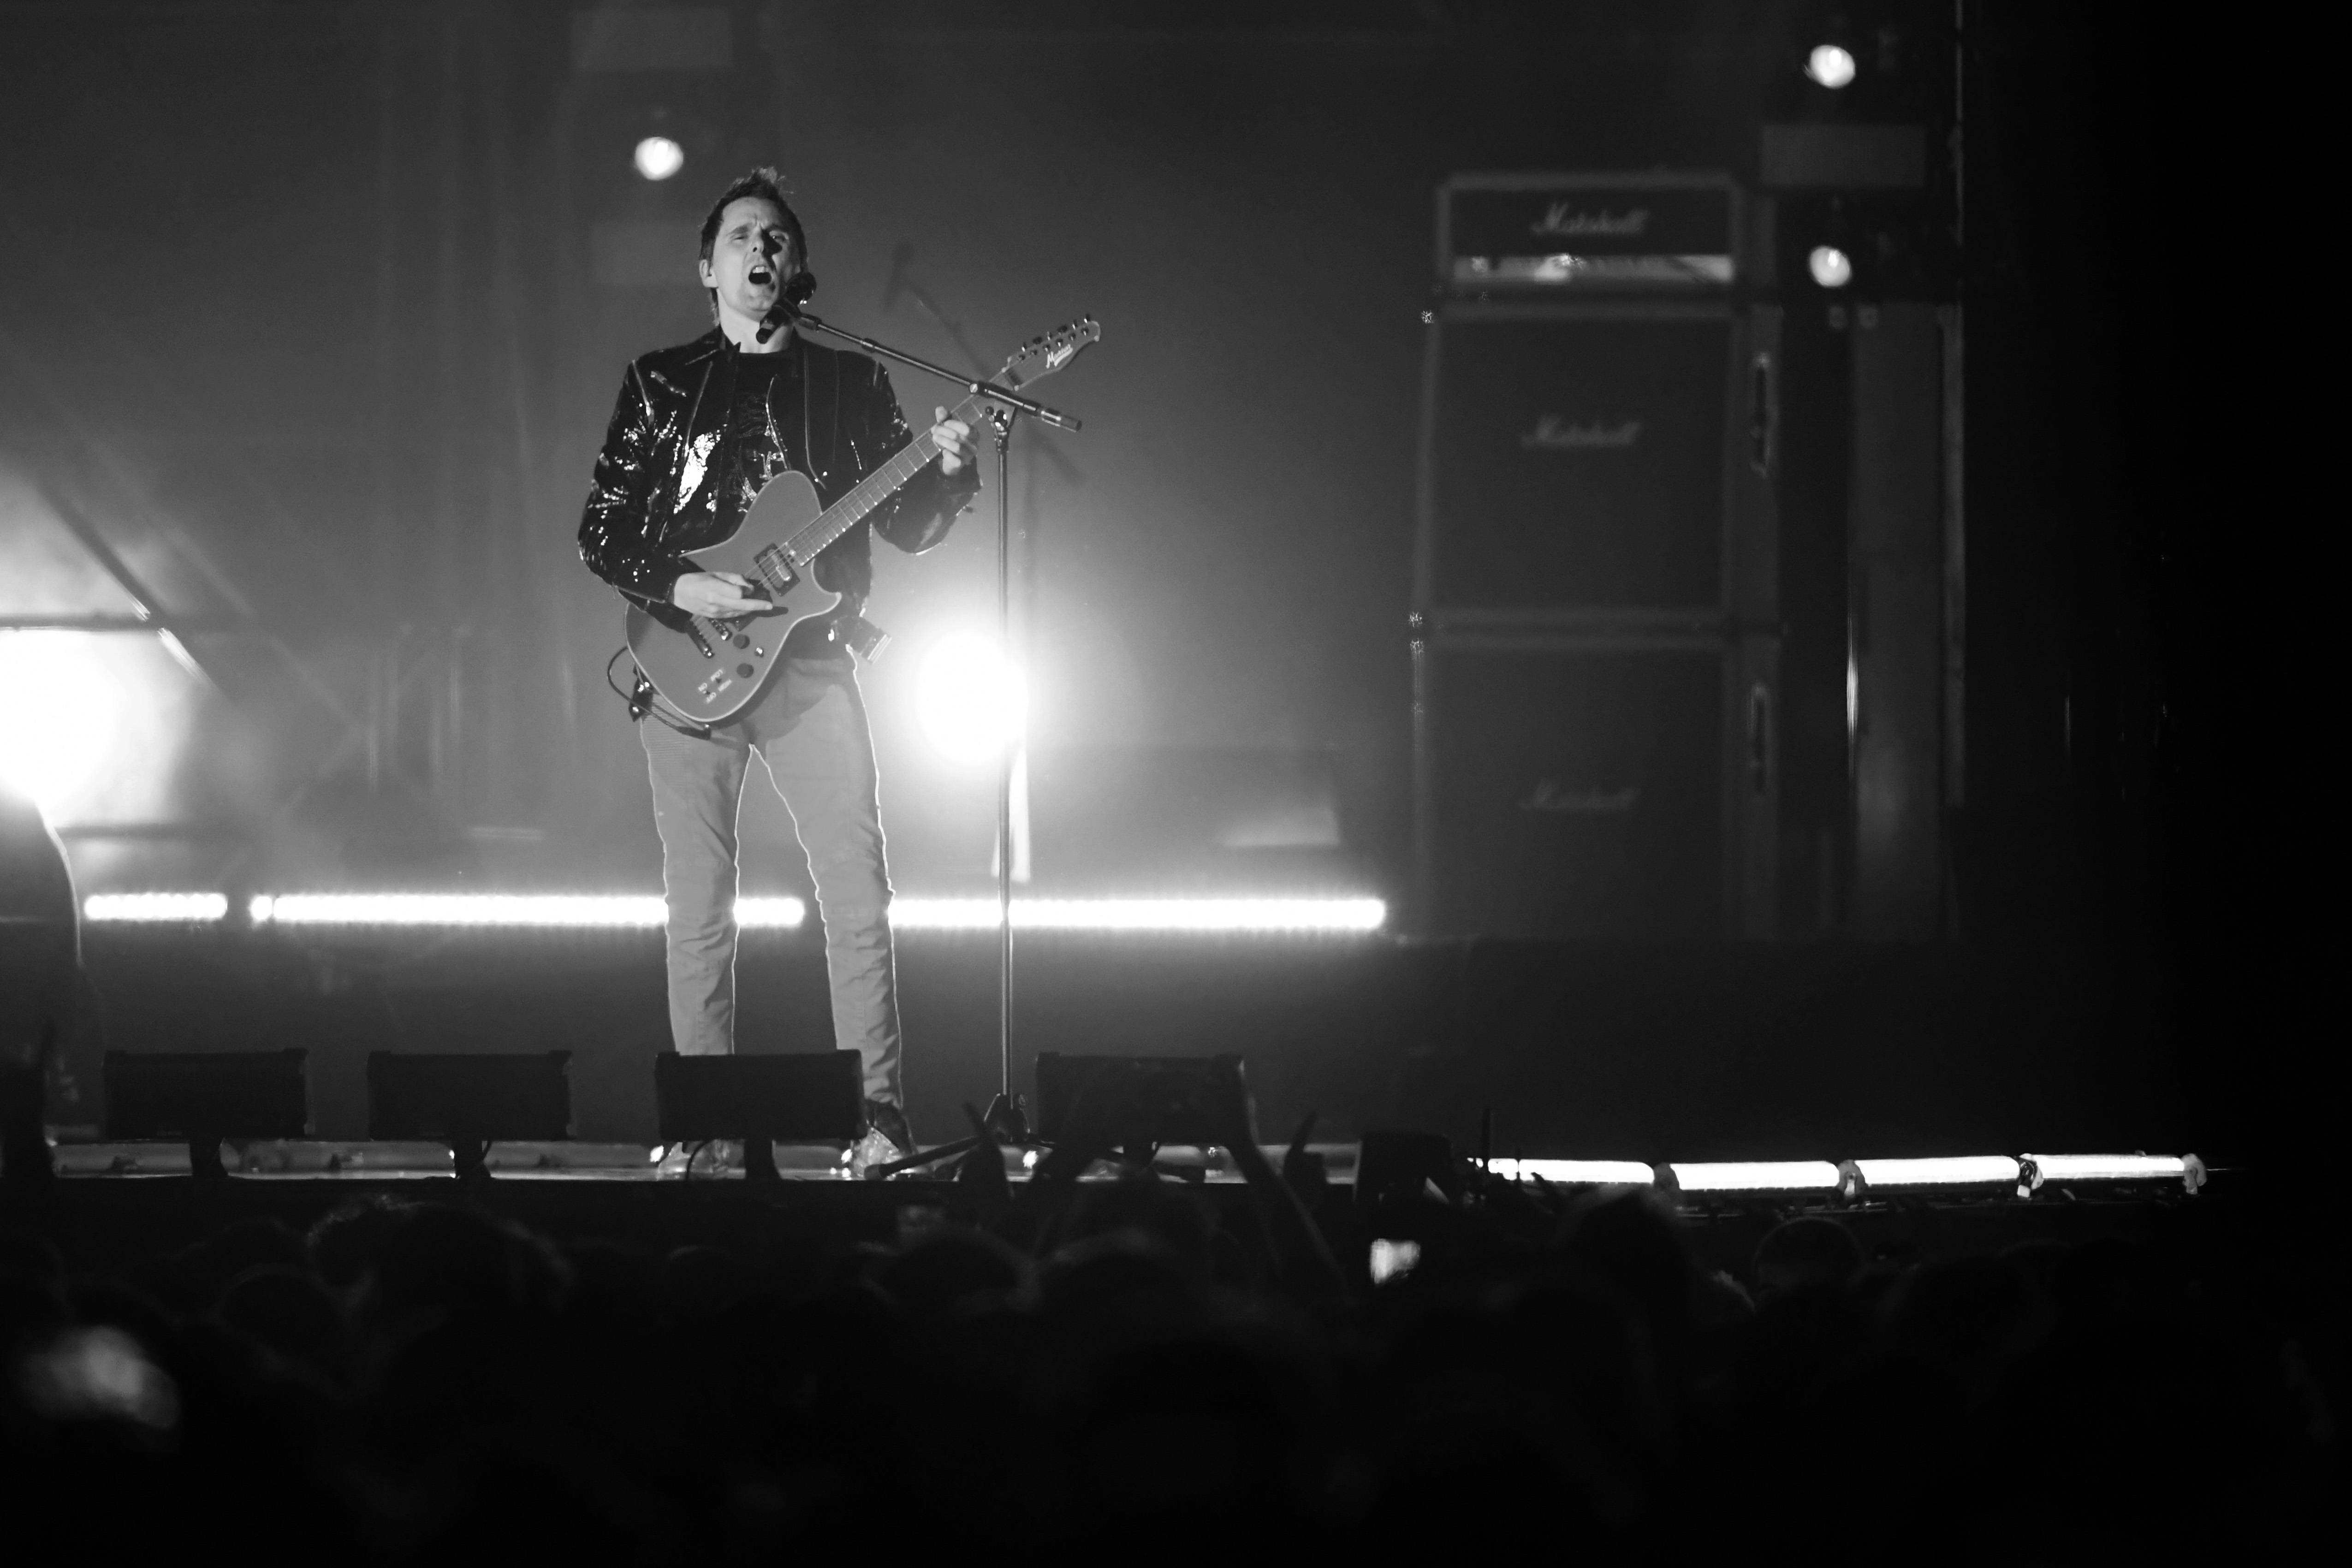 mgid:file:gsp:scenic:/international/mtv.es/images/Muse_-_MTV_World_Stage_-_MTV_EMAs_Bilbao_2018_-_21.JPG